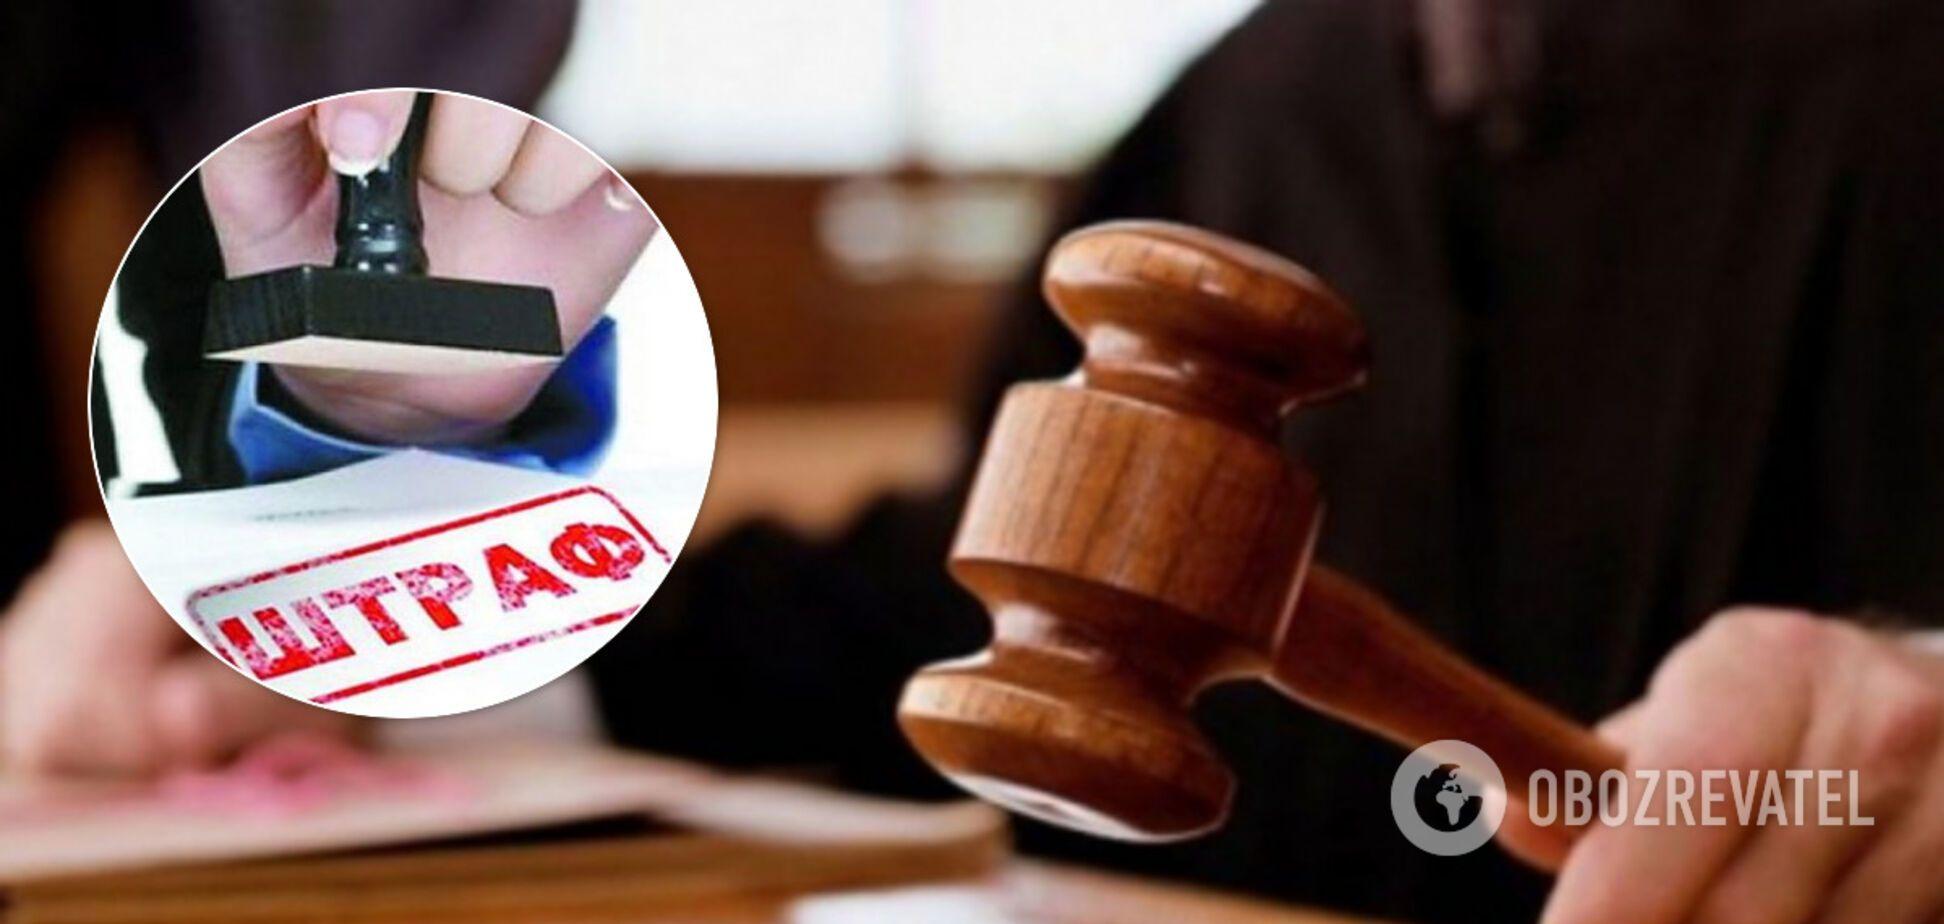 Мужчину оштрафовали на 850 гривен за передач взятки генералу полиции